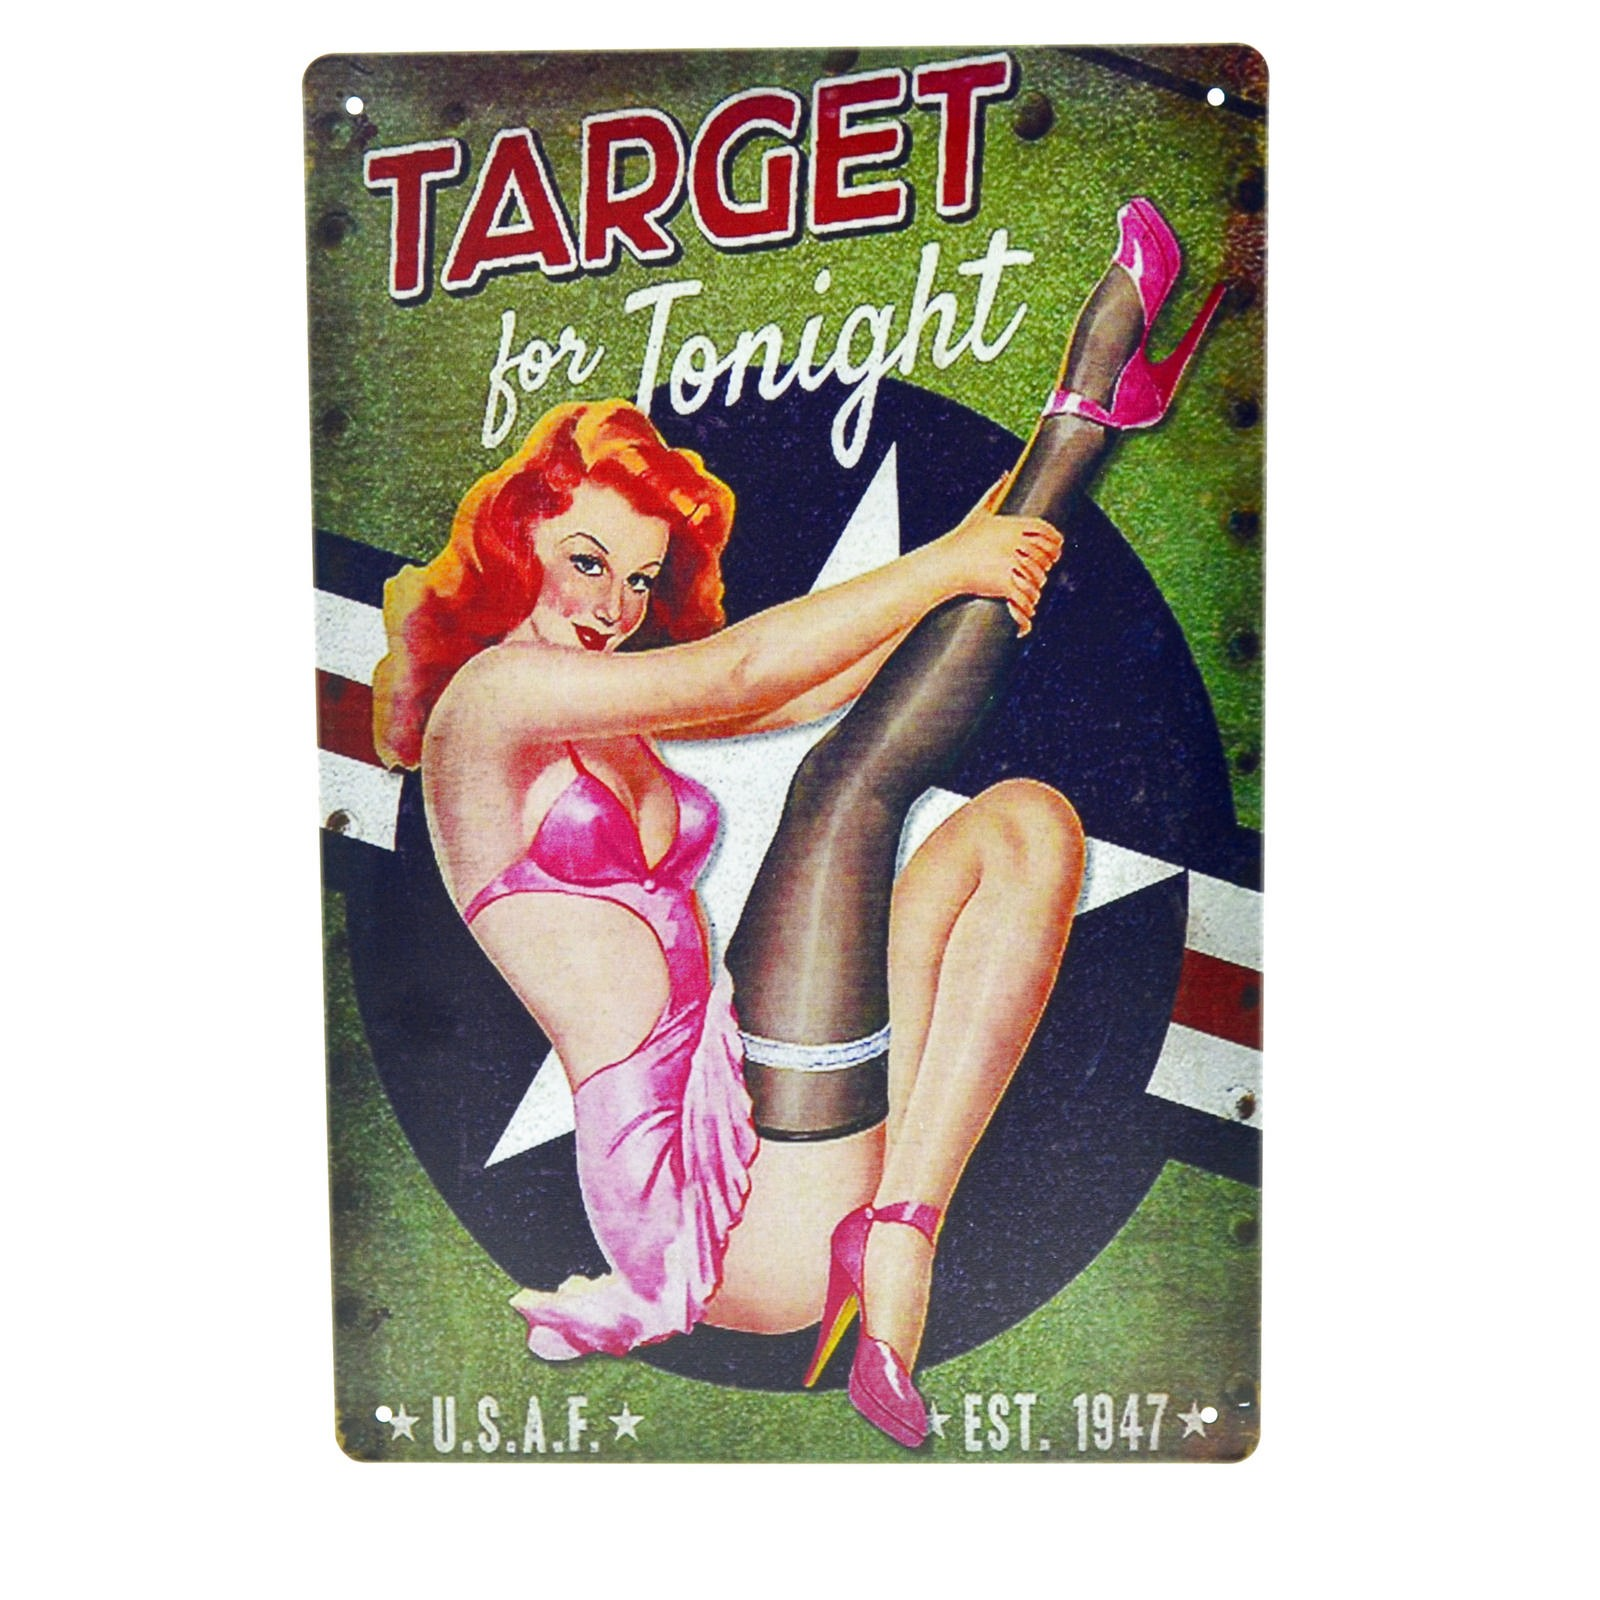 Cartel Metálico de Pin Up target for tonight